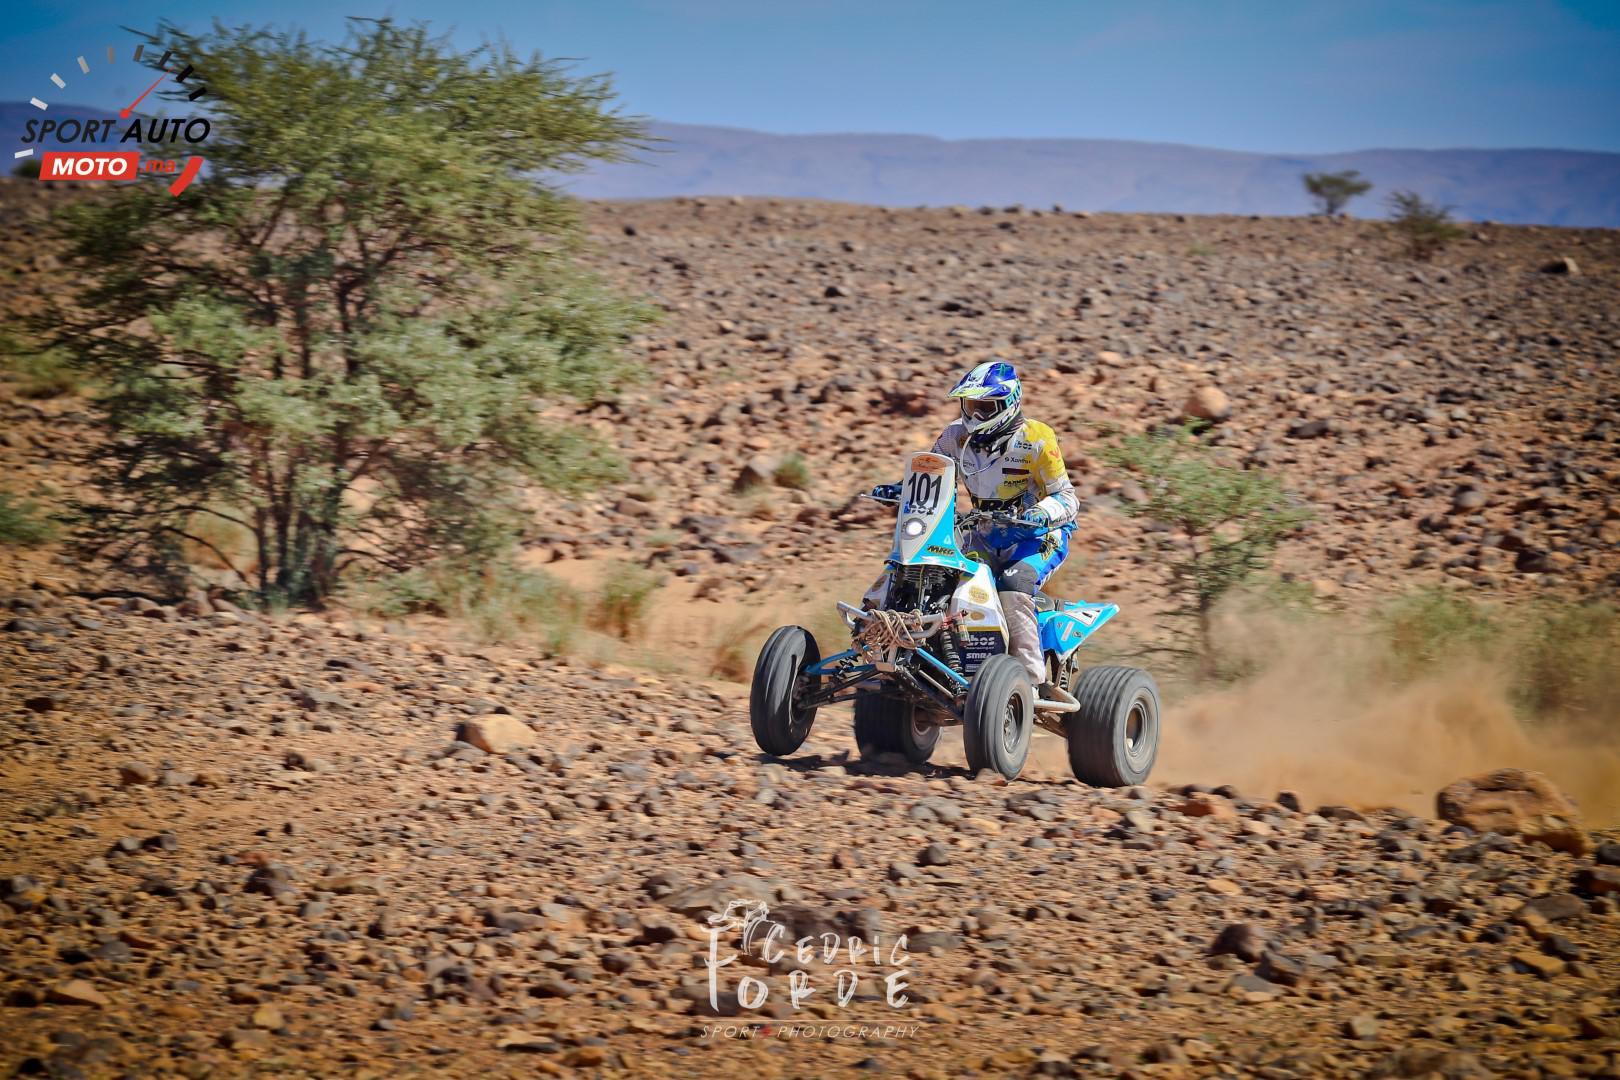 hearts-of-morocco-2018-besson-et-ivan-remportent-l-etape-3-etape-4-annulee-894-5.jpg